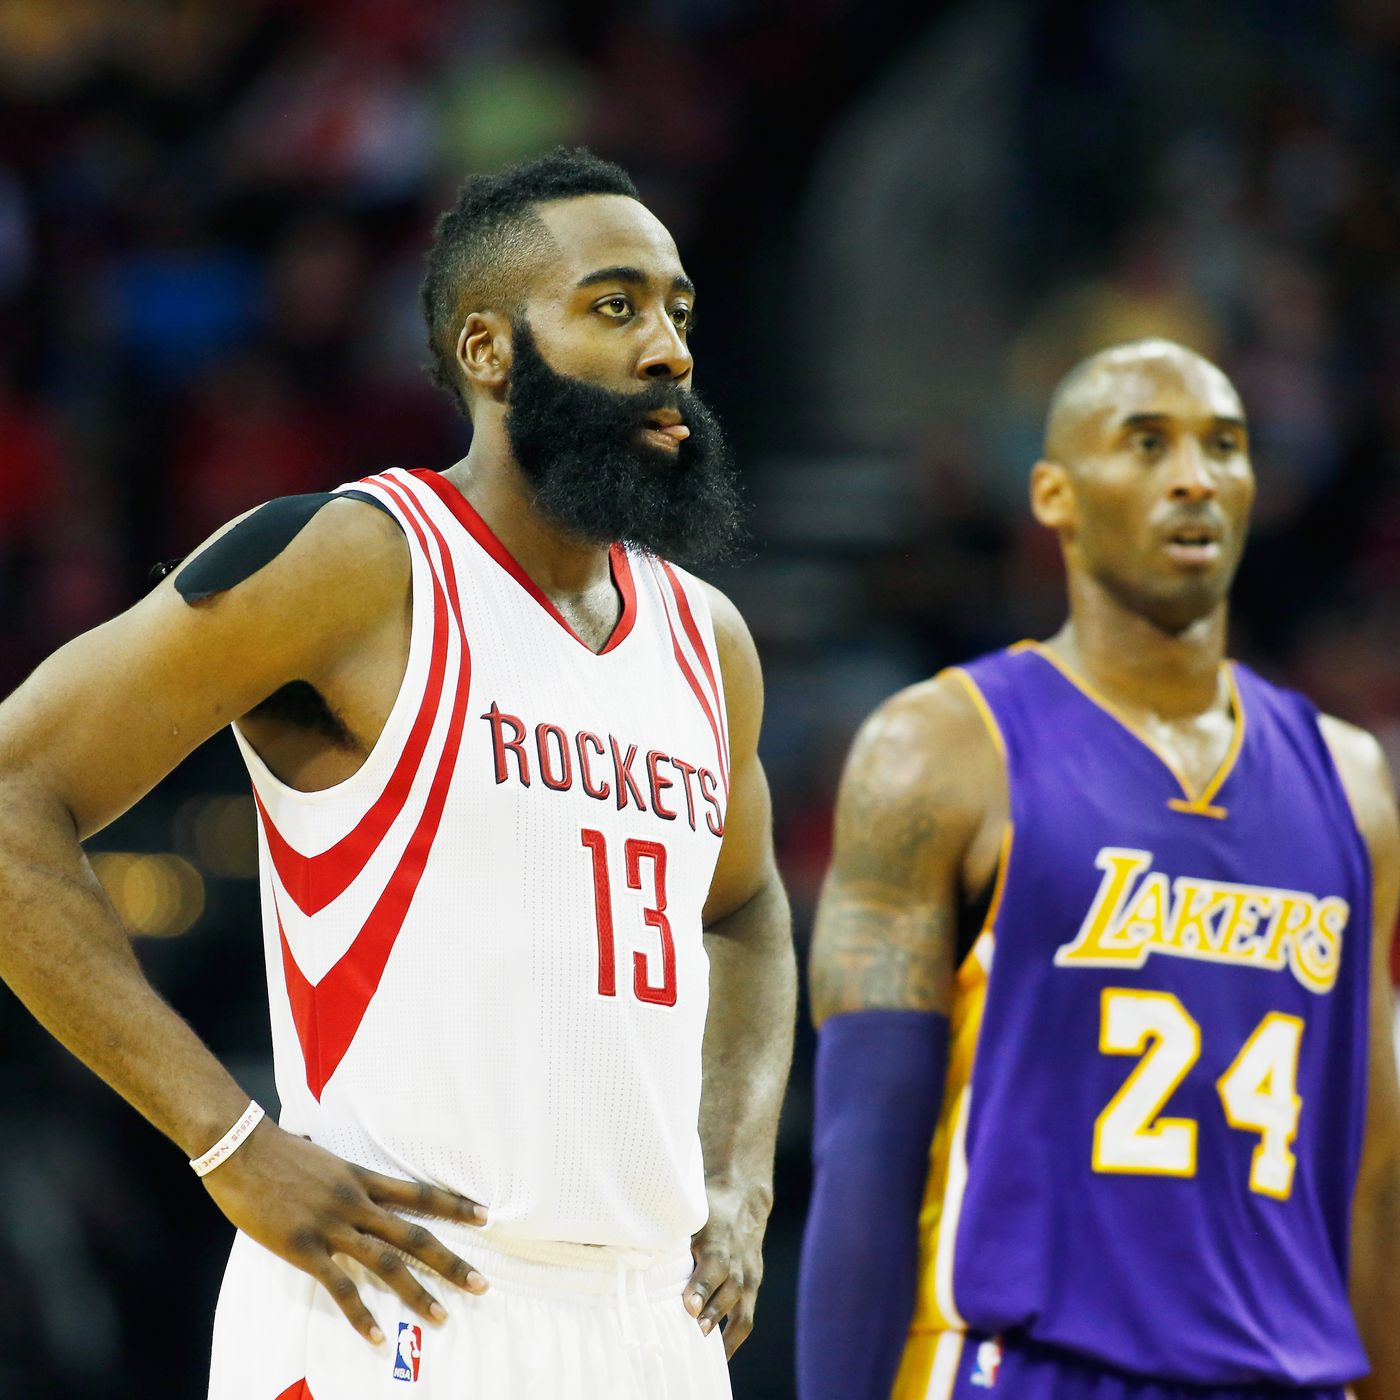 ee2b743163e Luke Walton says James Harden s historic scoring run reminds him of Kobe  Bryant